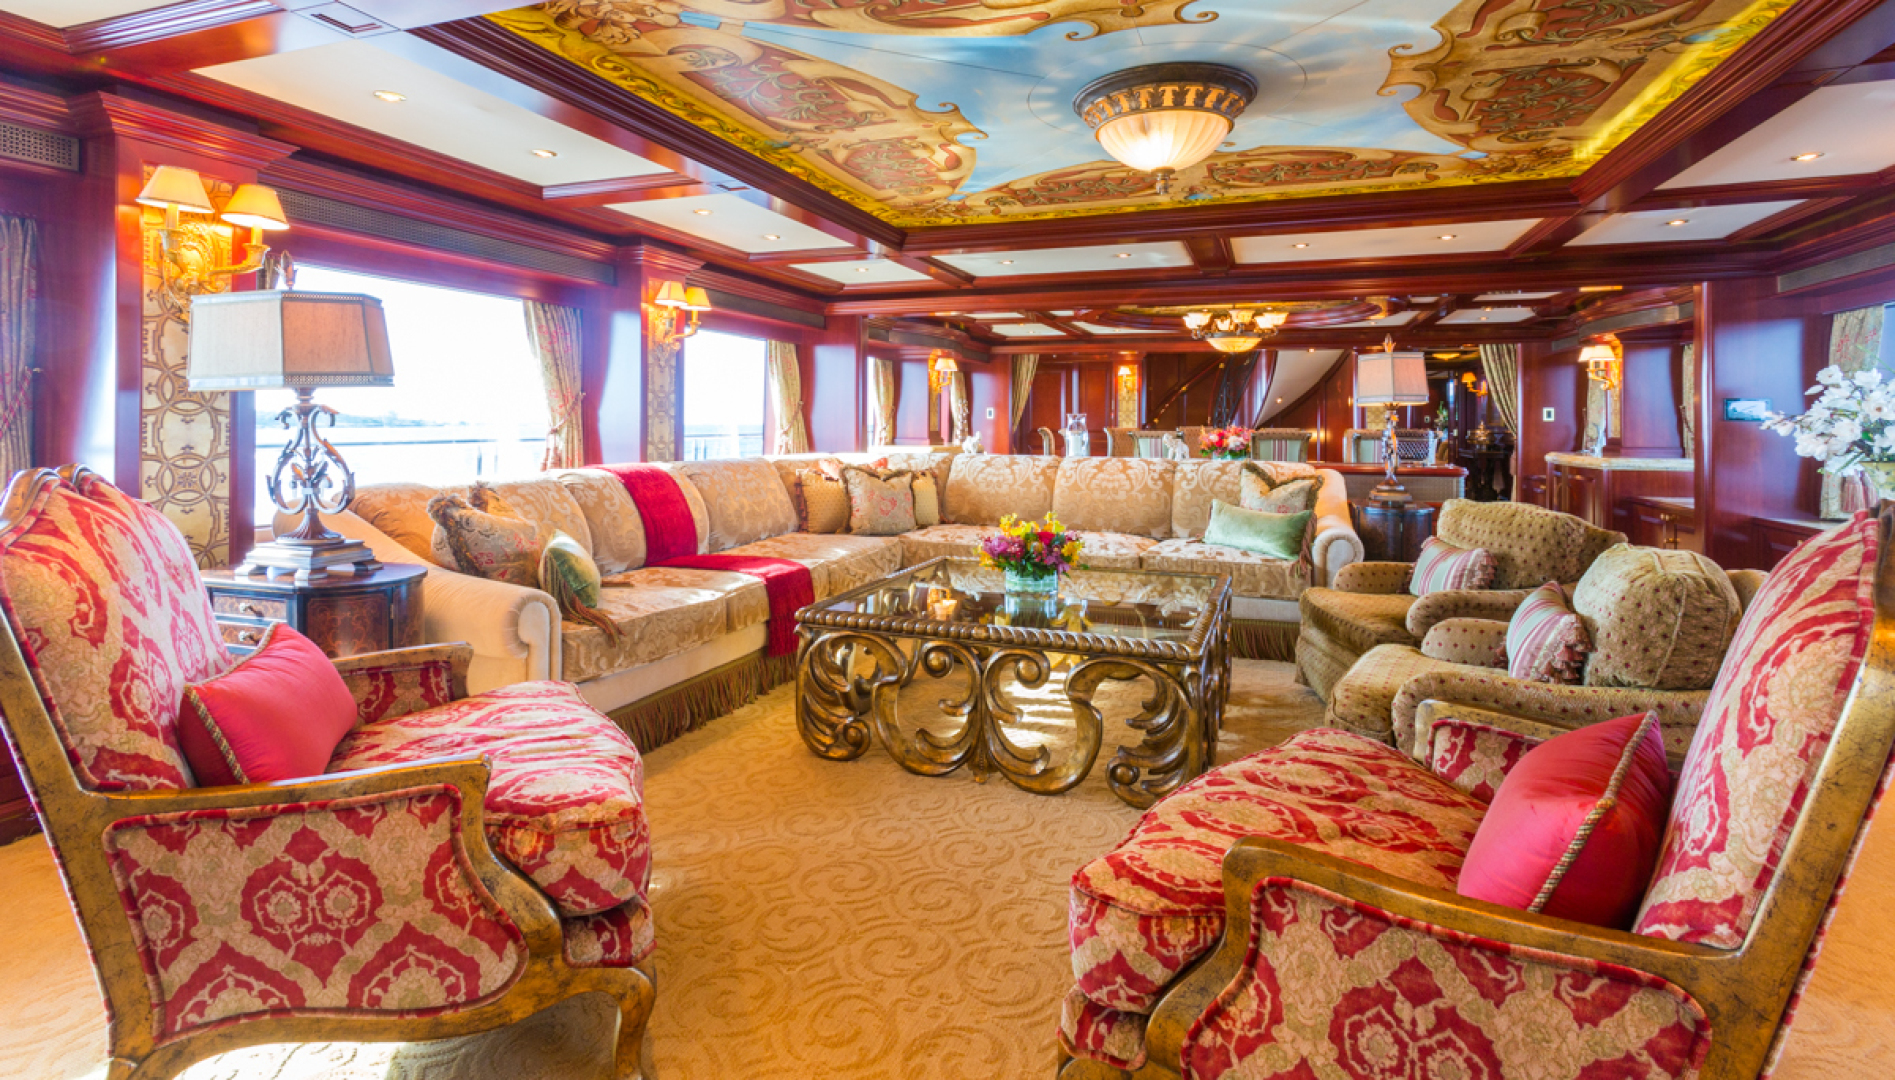 Trinity Yachts-164 Tri-deck Motor Yacht 2008-Amarula Sun Fort Lauderdale-Florida-United States-Main Salon Seating-1513921 | Thumbnail